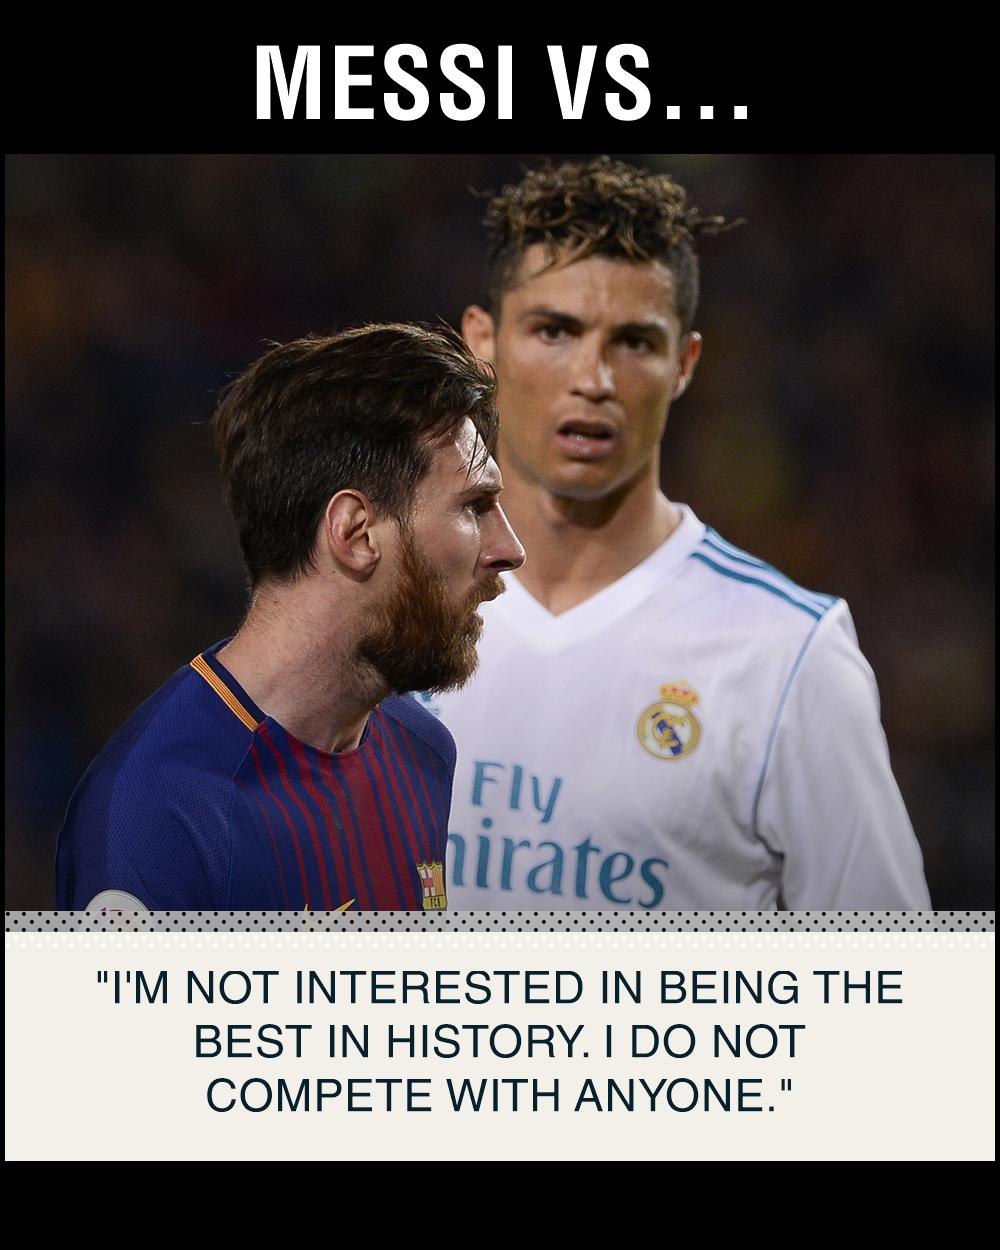 Messi-khong-co-hung-thu-canh-tranh-voi-Ronaldo-1